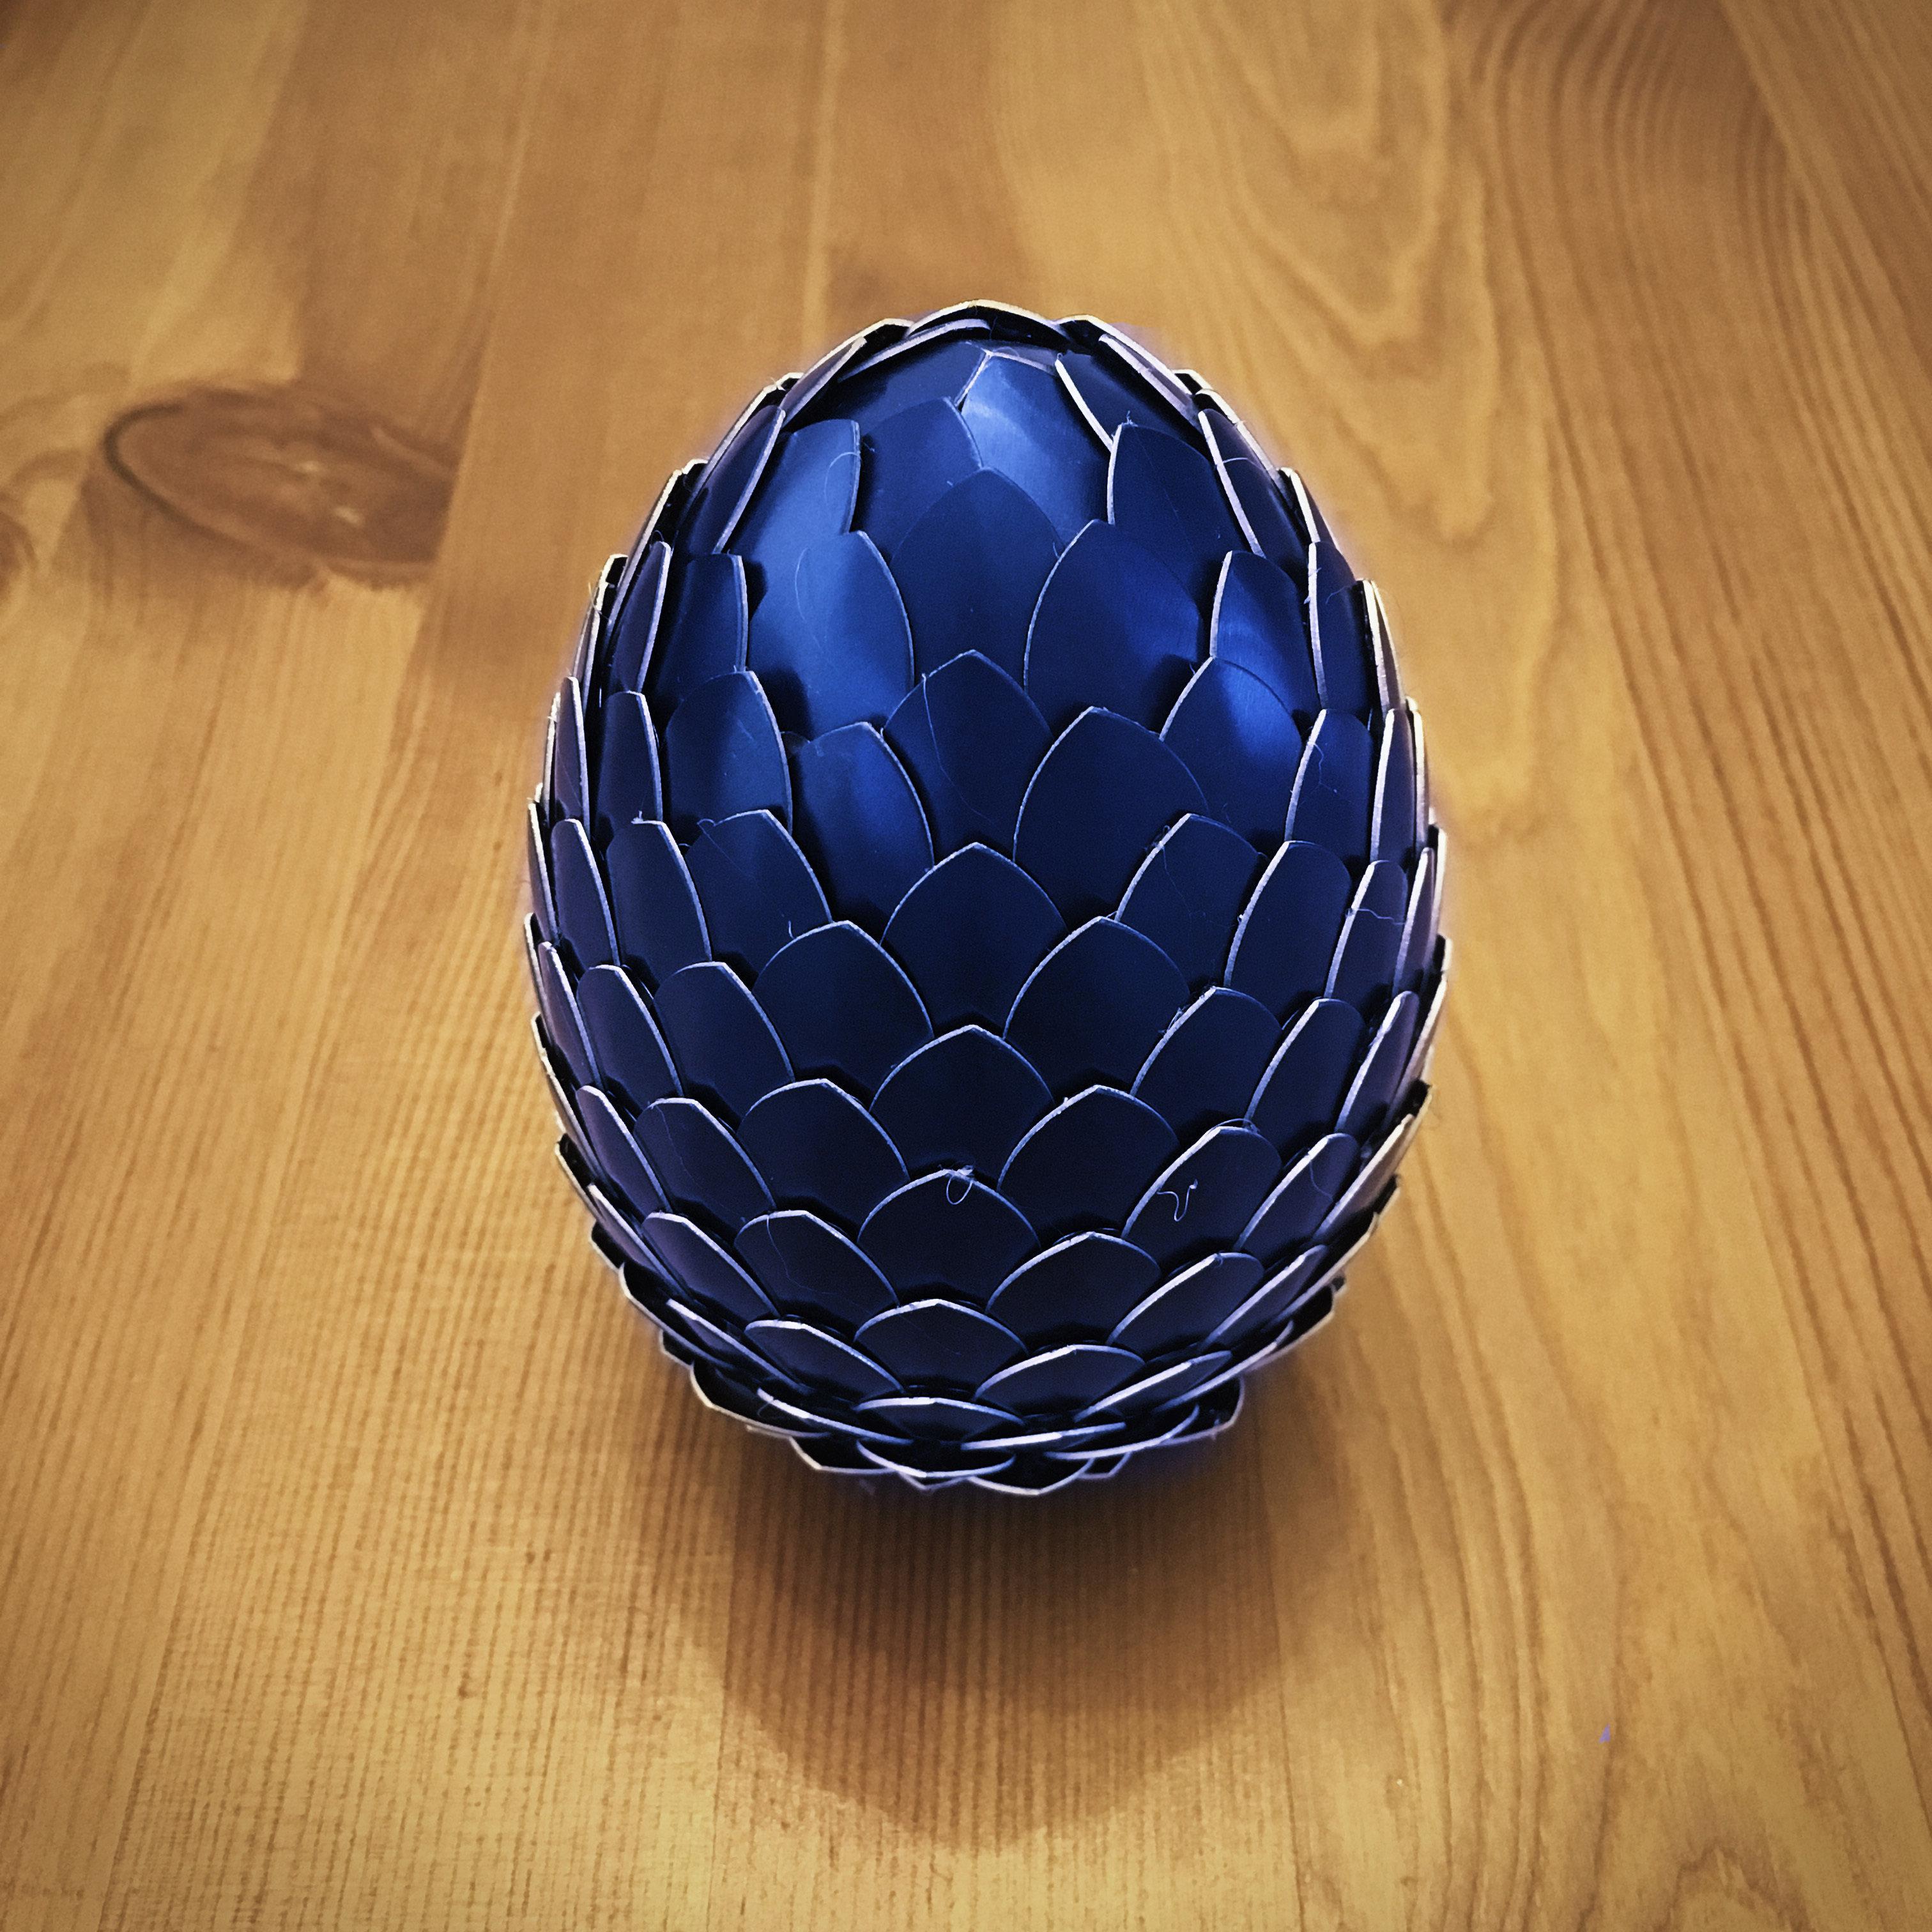 Dragon Egg - Blue DE003